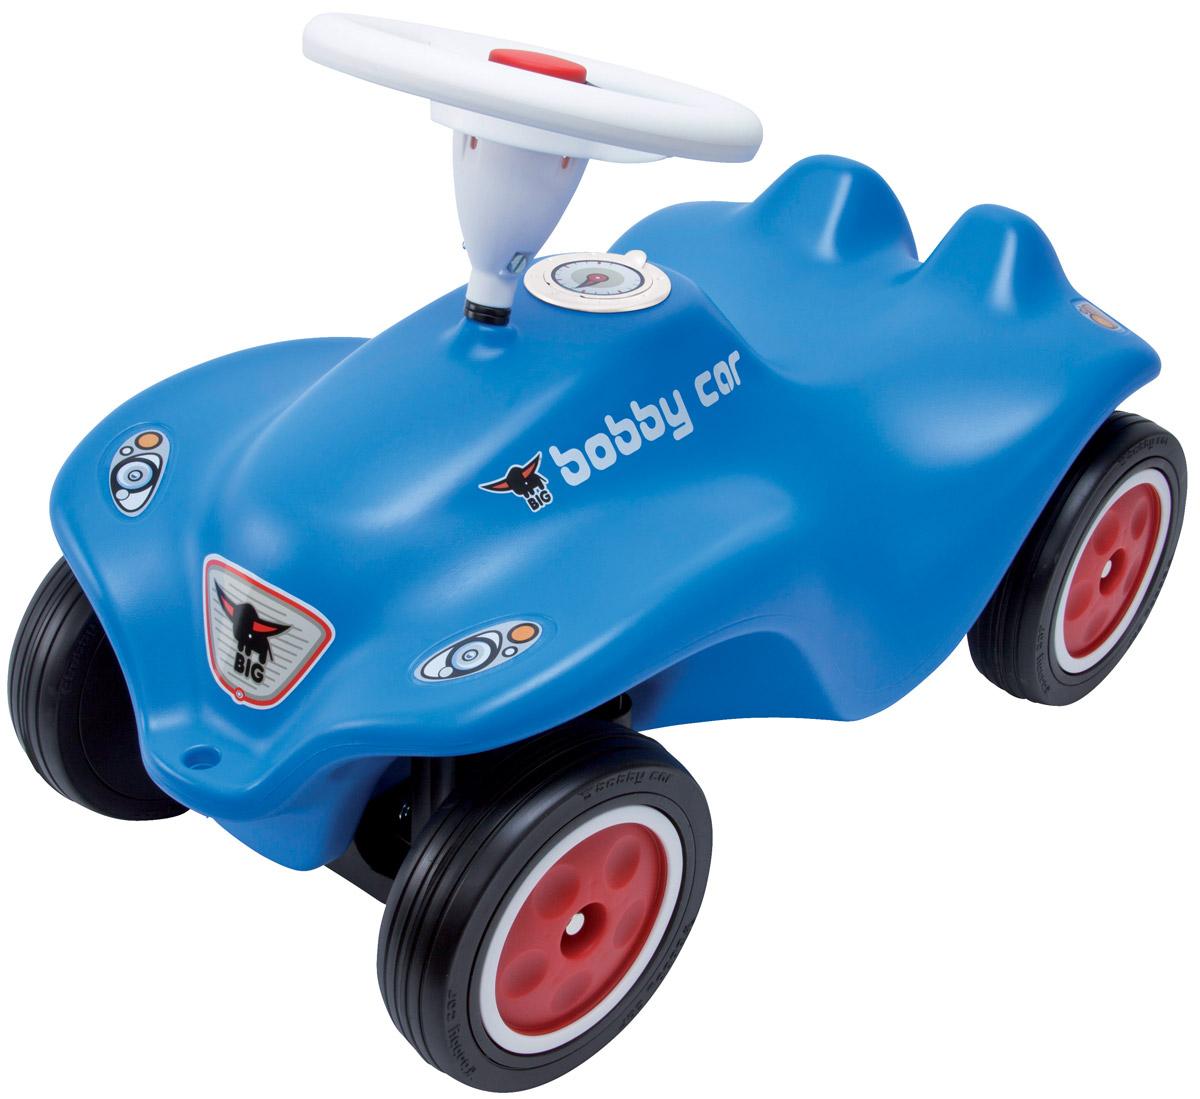 Big Машинка-каталка New Bobby Car